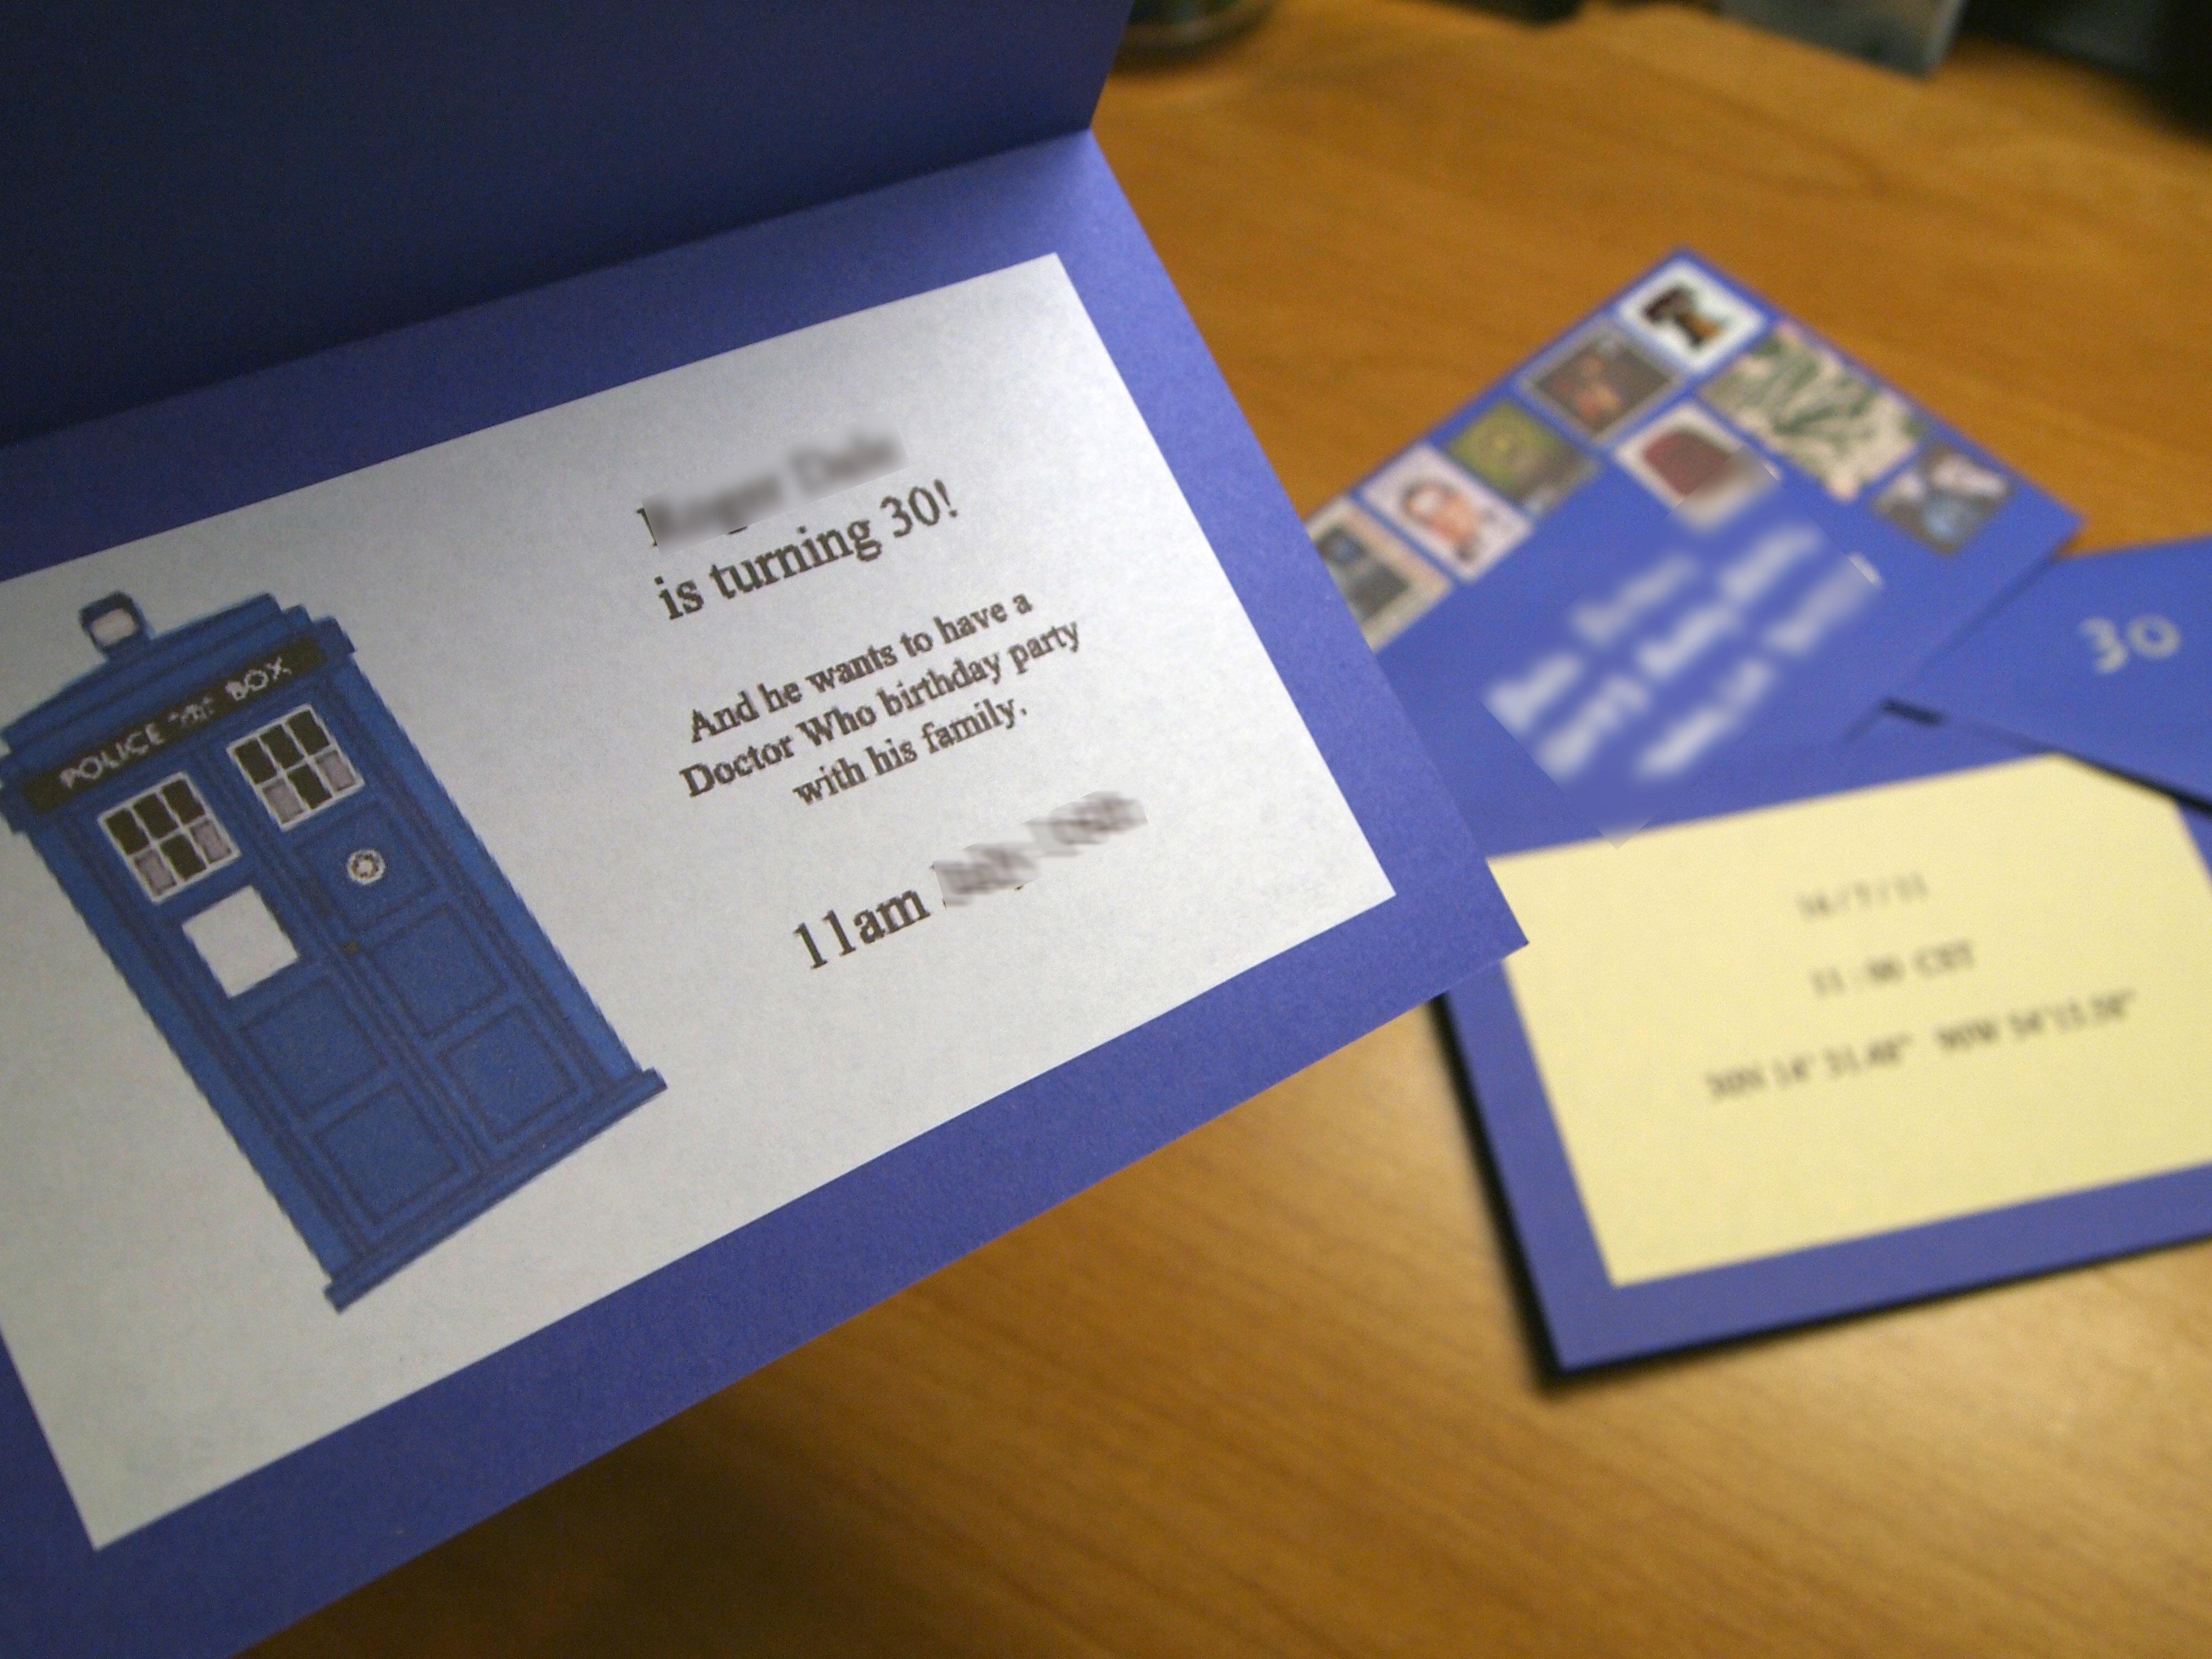 Doctor Who Invitations   Random Creativity - Doctor Who Party Invitations Printable Free